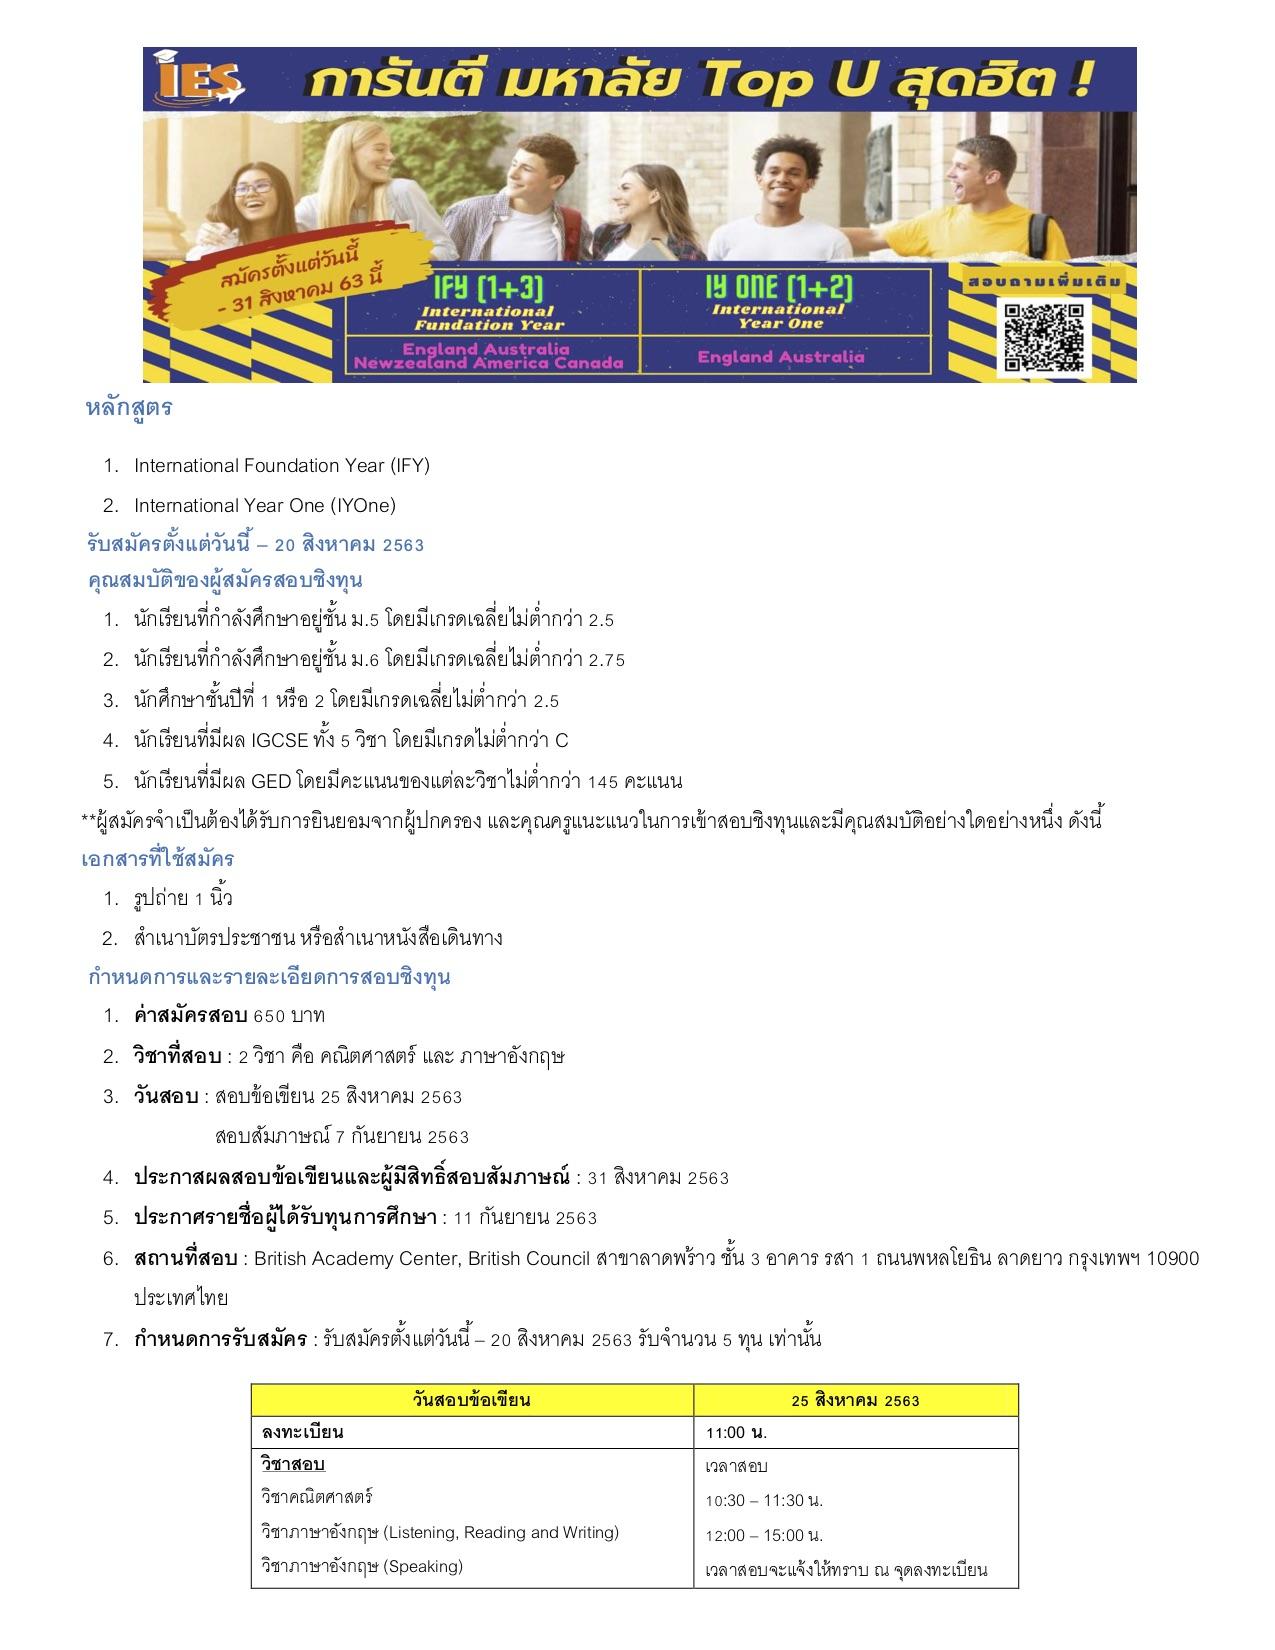 IFY Information-1